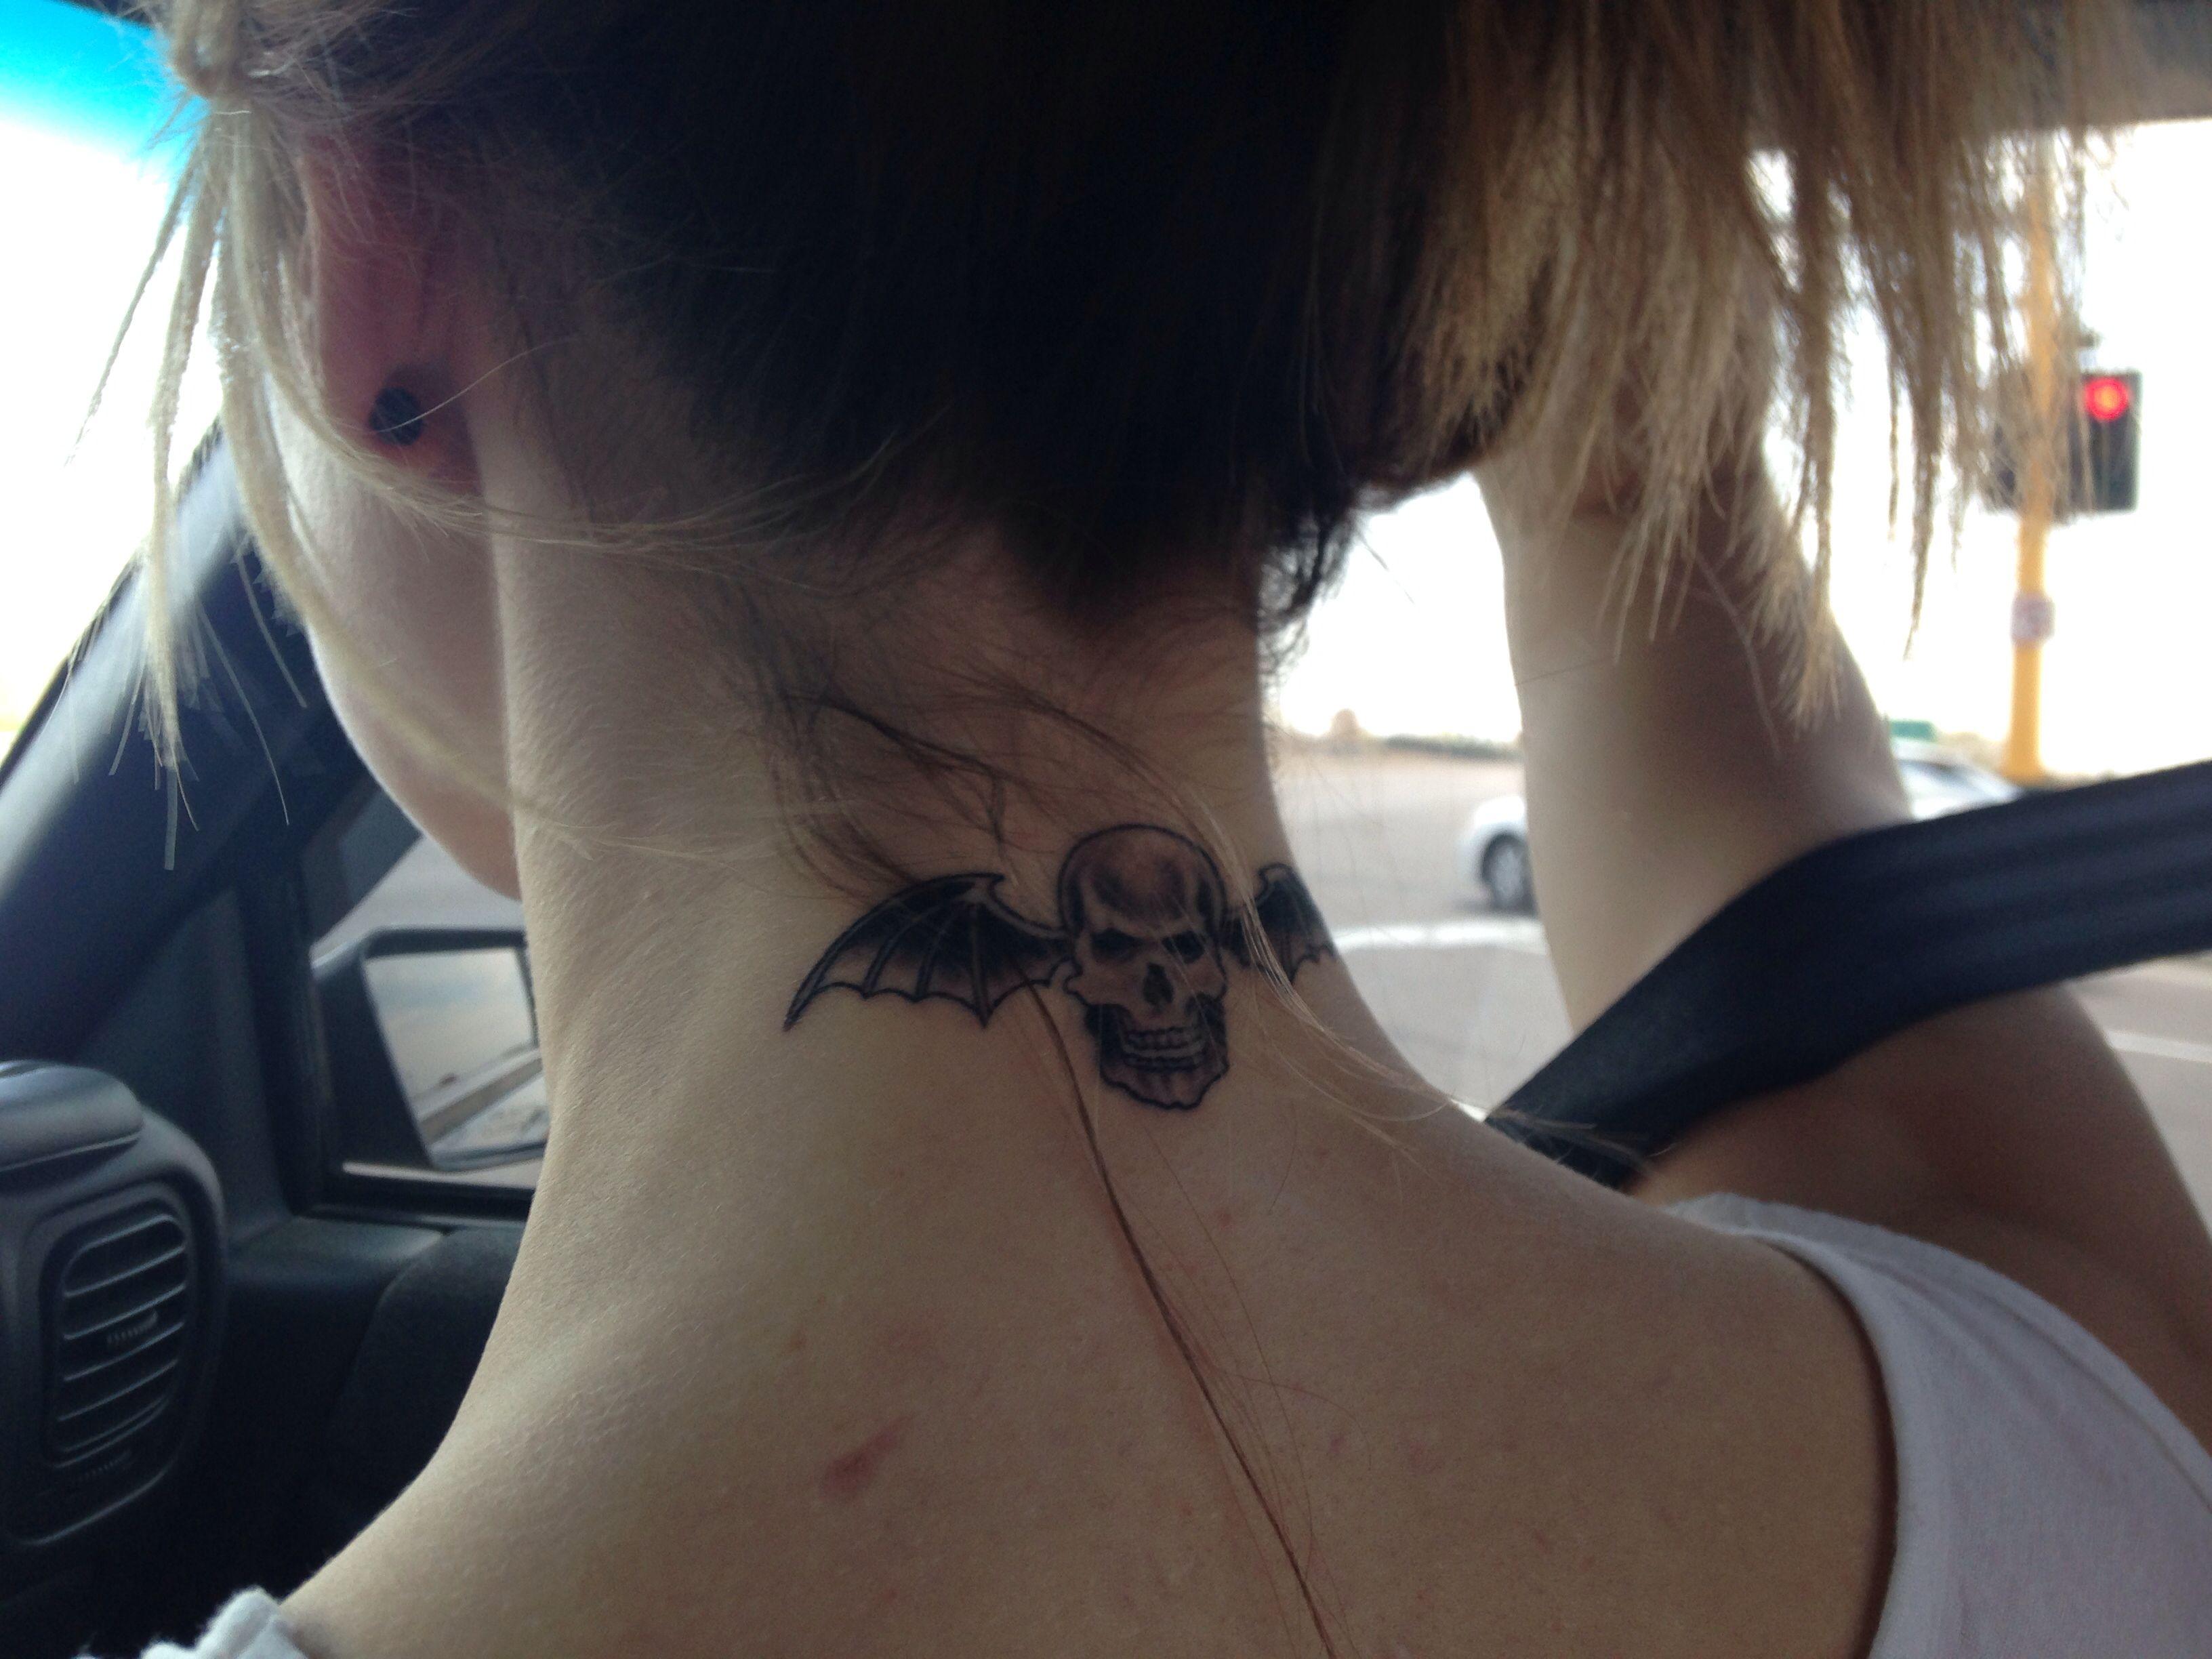 Av av avenged sevenfold tattoo designs - Avenged Sevenfold Tattoo